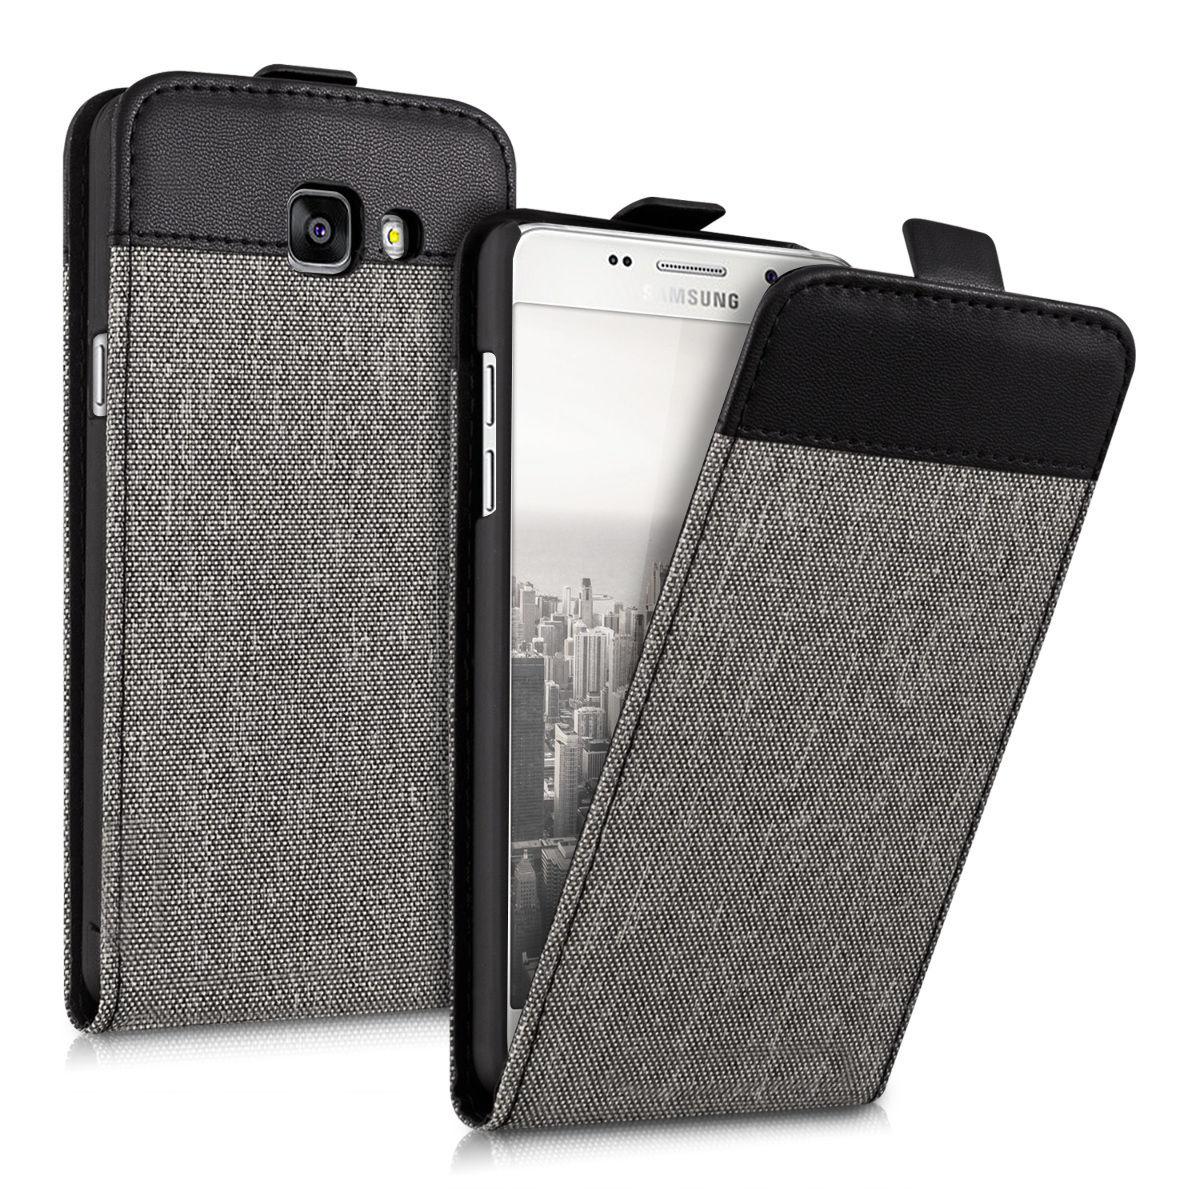 Pouzdro pro Samsung Galaxy A5 (2016) šedé